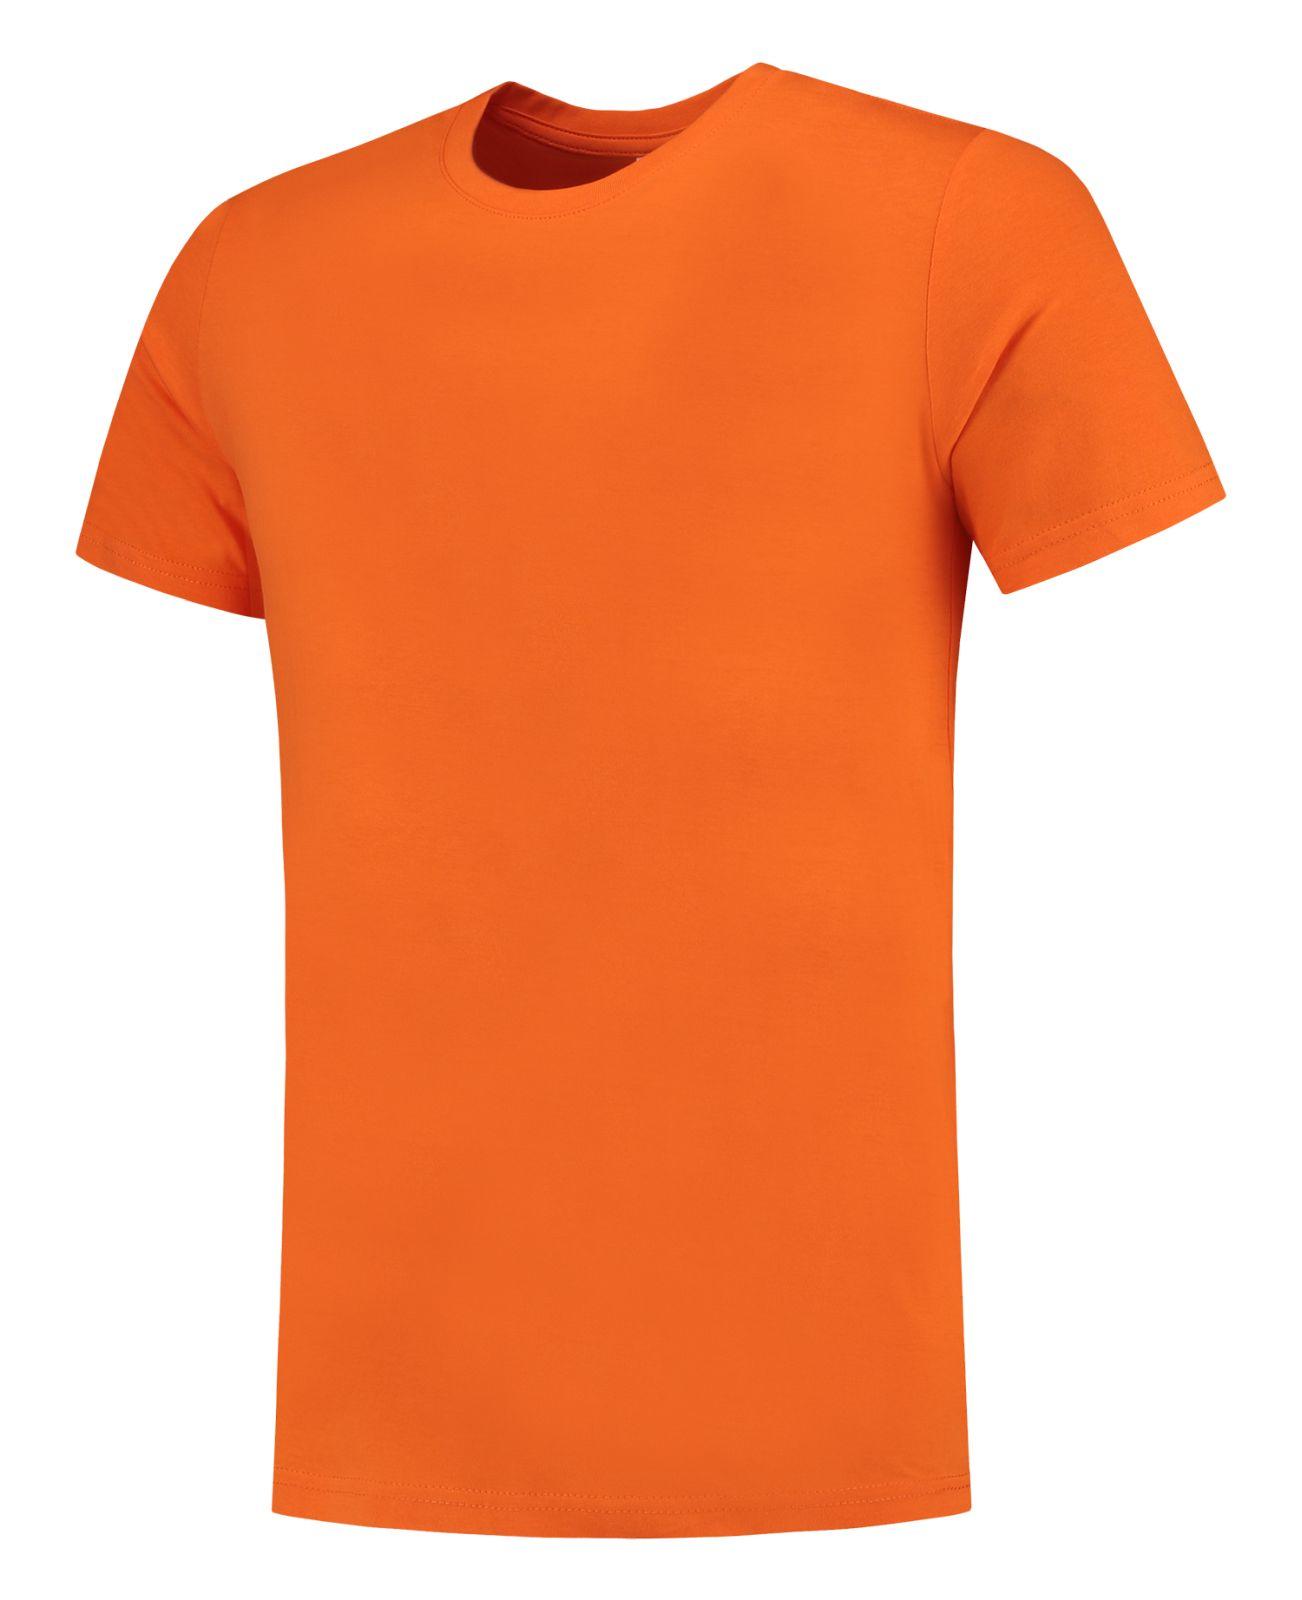 Tricorp Casual T-shirts 101004-TFR160 oranje(Orange)